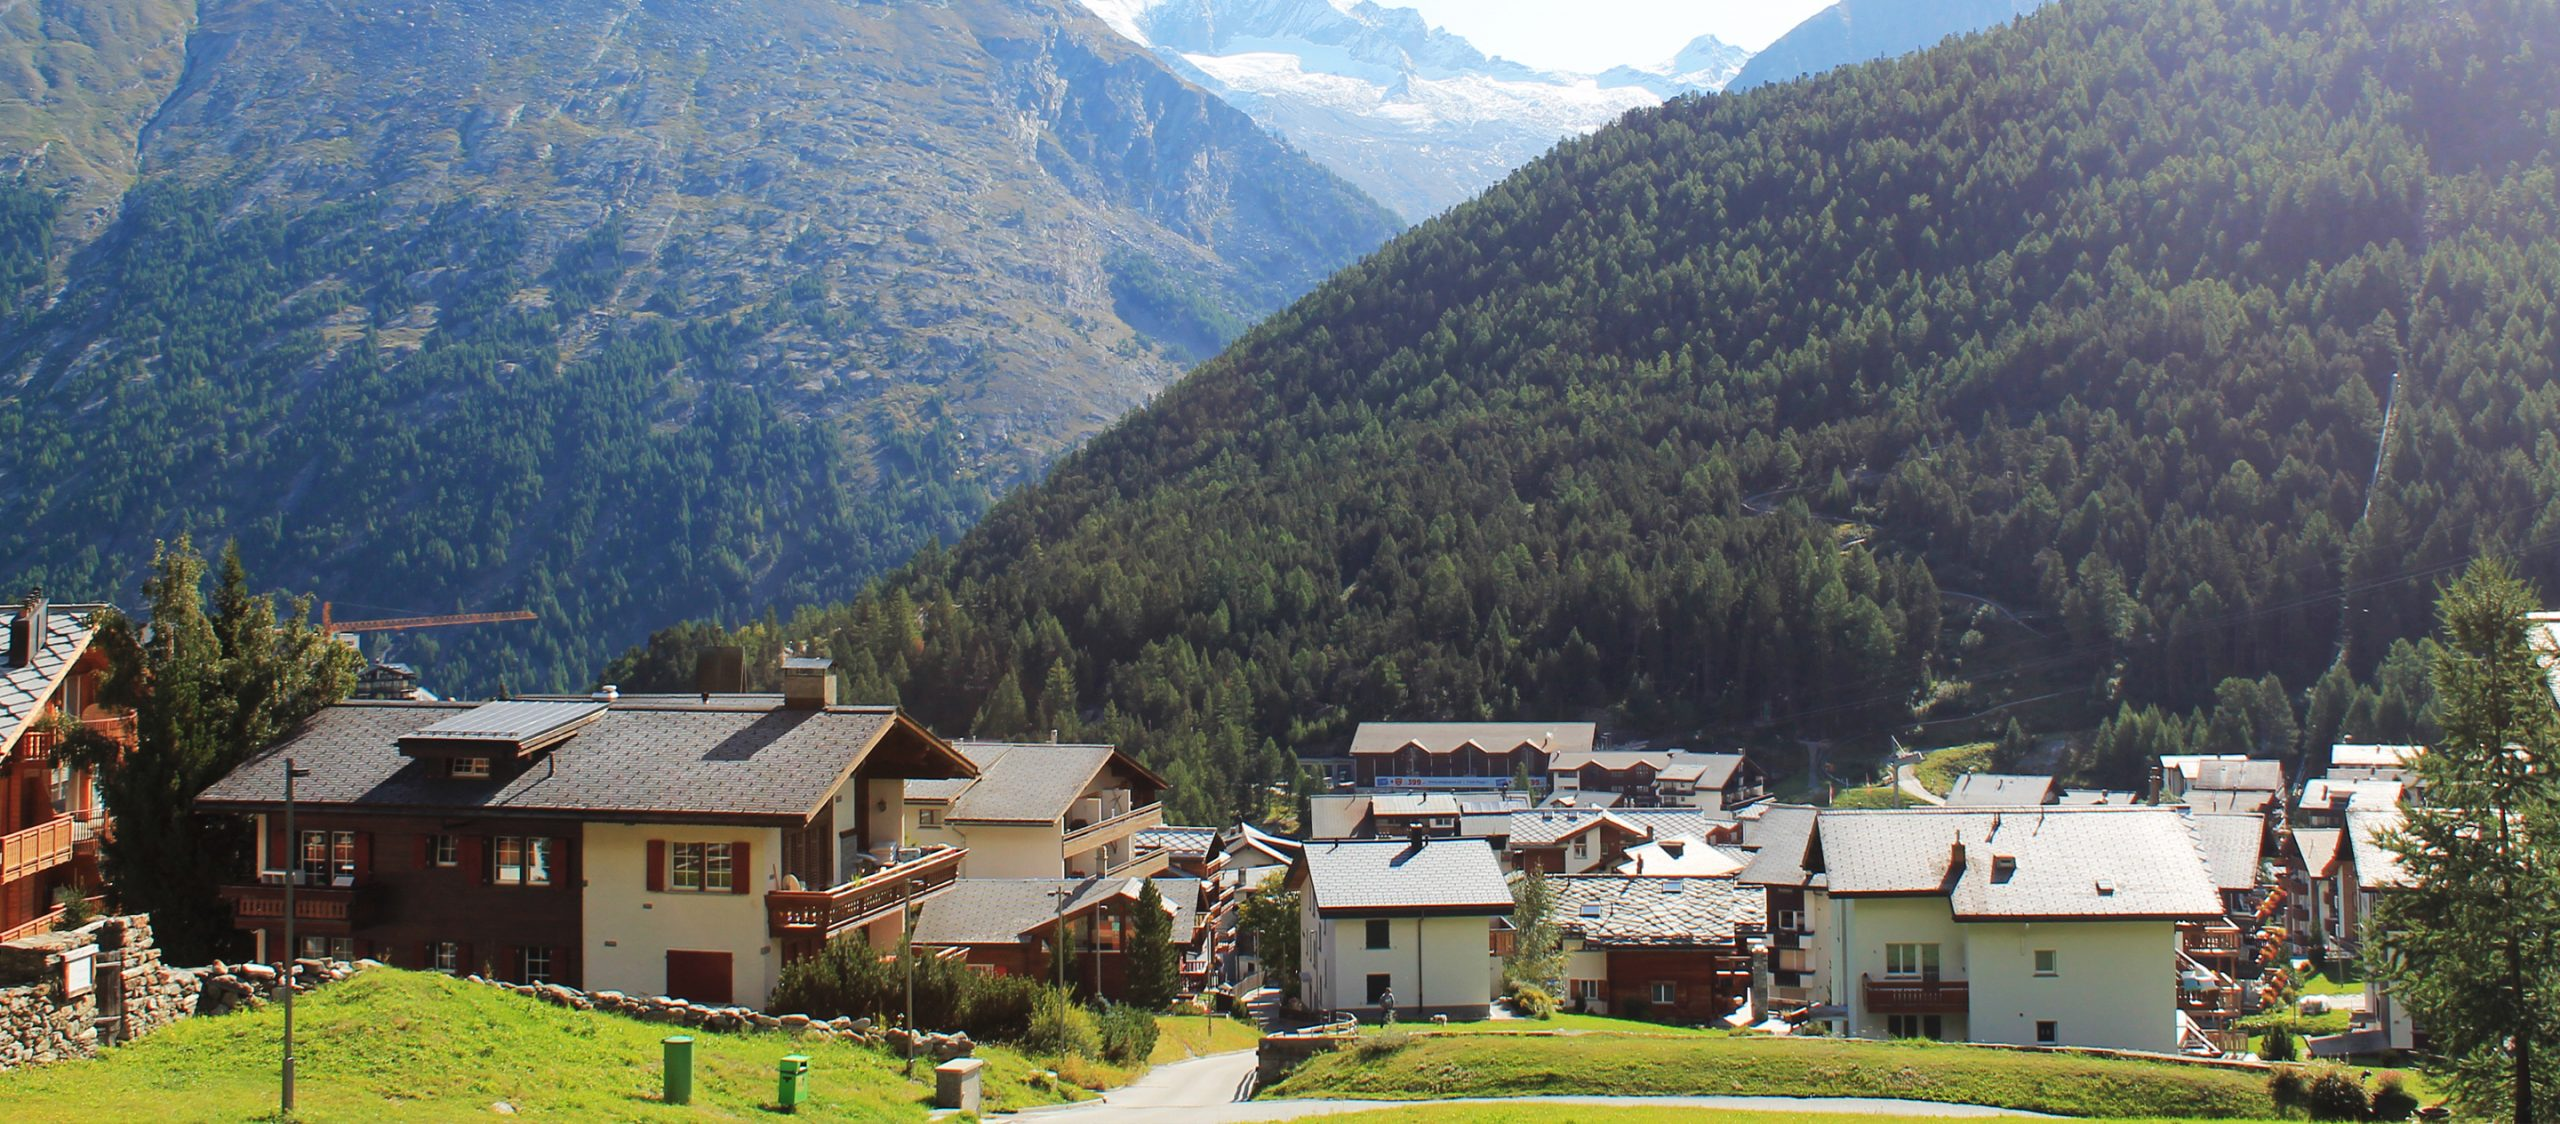 Saas-Fee หมู่บ้านในสวิตเซอร์แลนด์ที่เปิดประตูออกมาก็เจอภูเขา 13 ยอดโอบล้อม